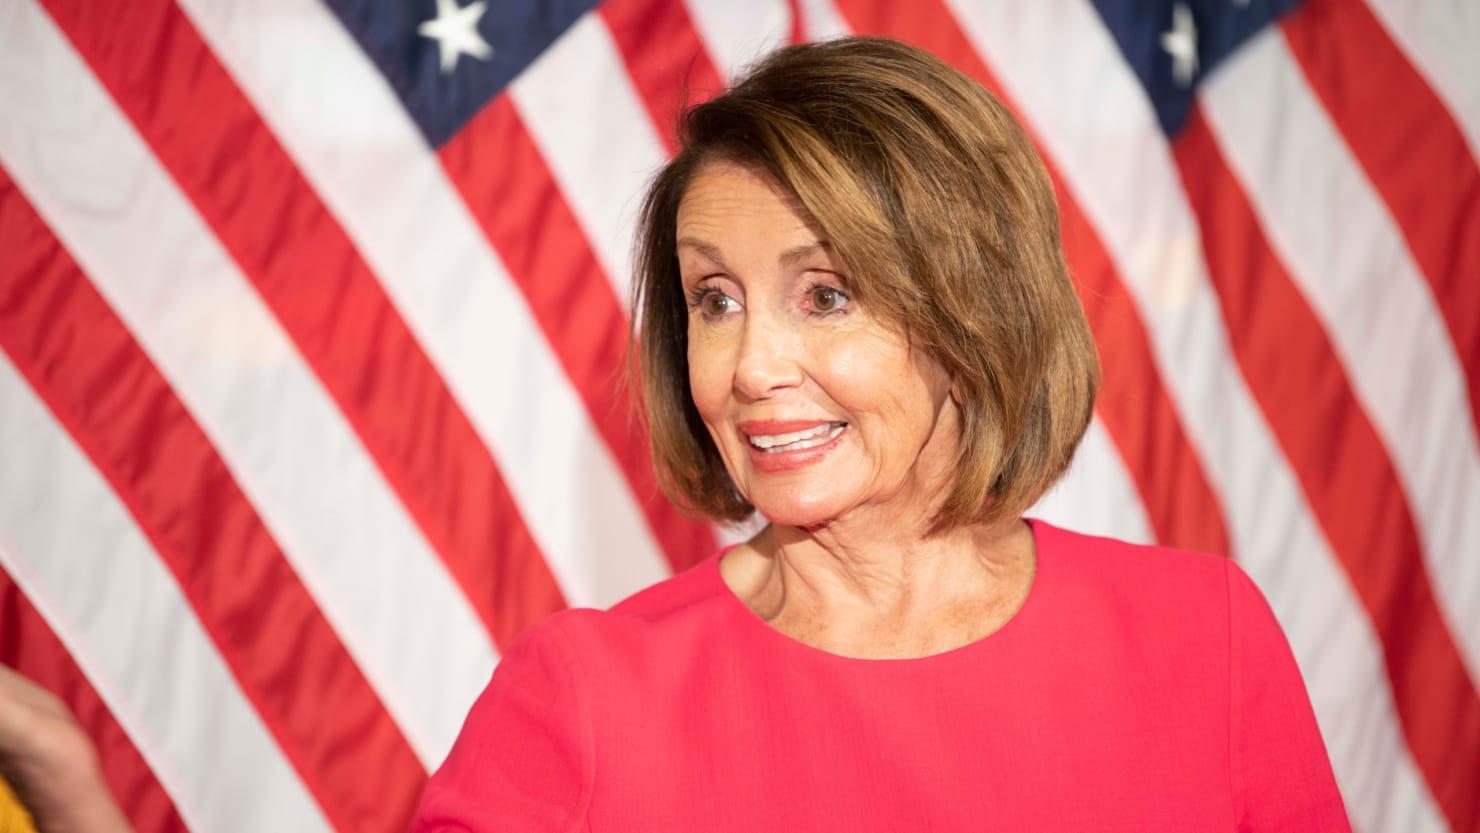 thedailybeast.com - Victoria Albert - Nancy Pelosi Asks Trump to Postpone State of the Union Address Until Shutdown Ends